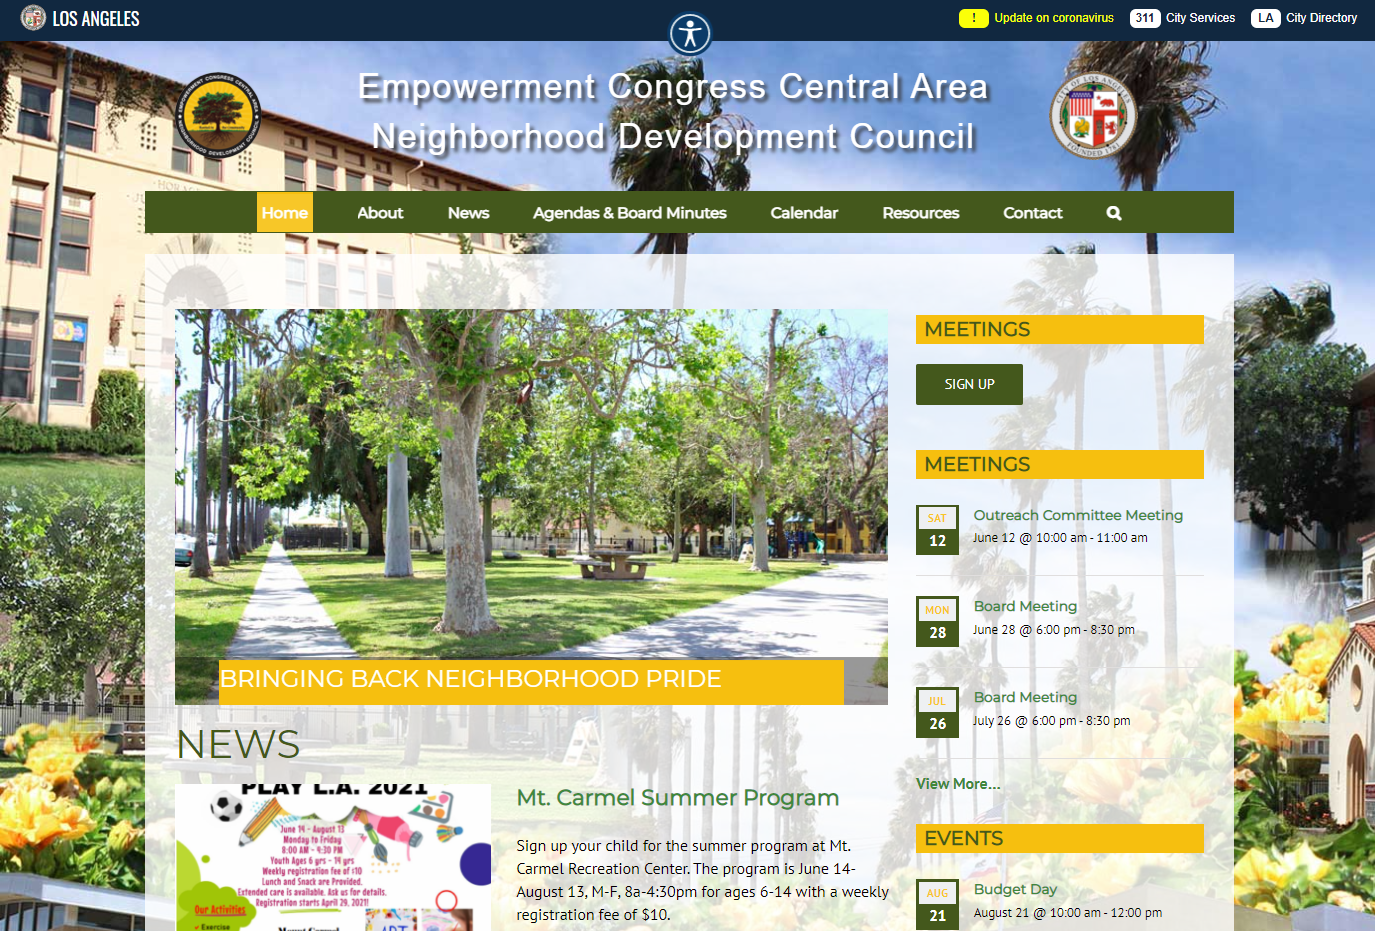 ECCANDC Homepage